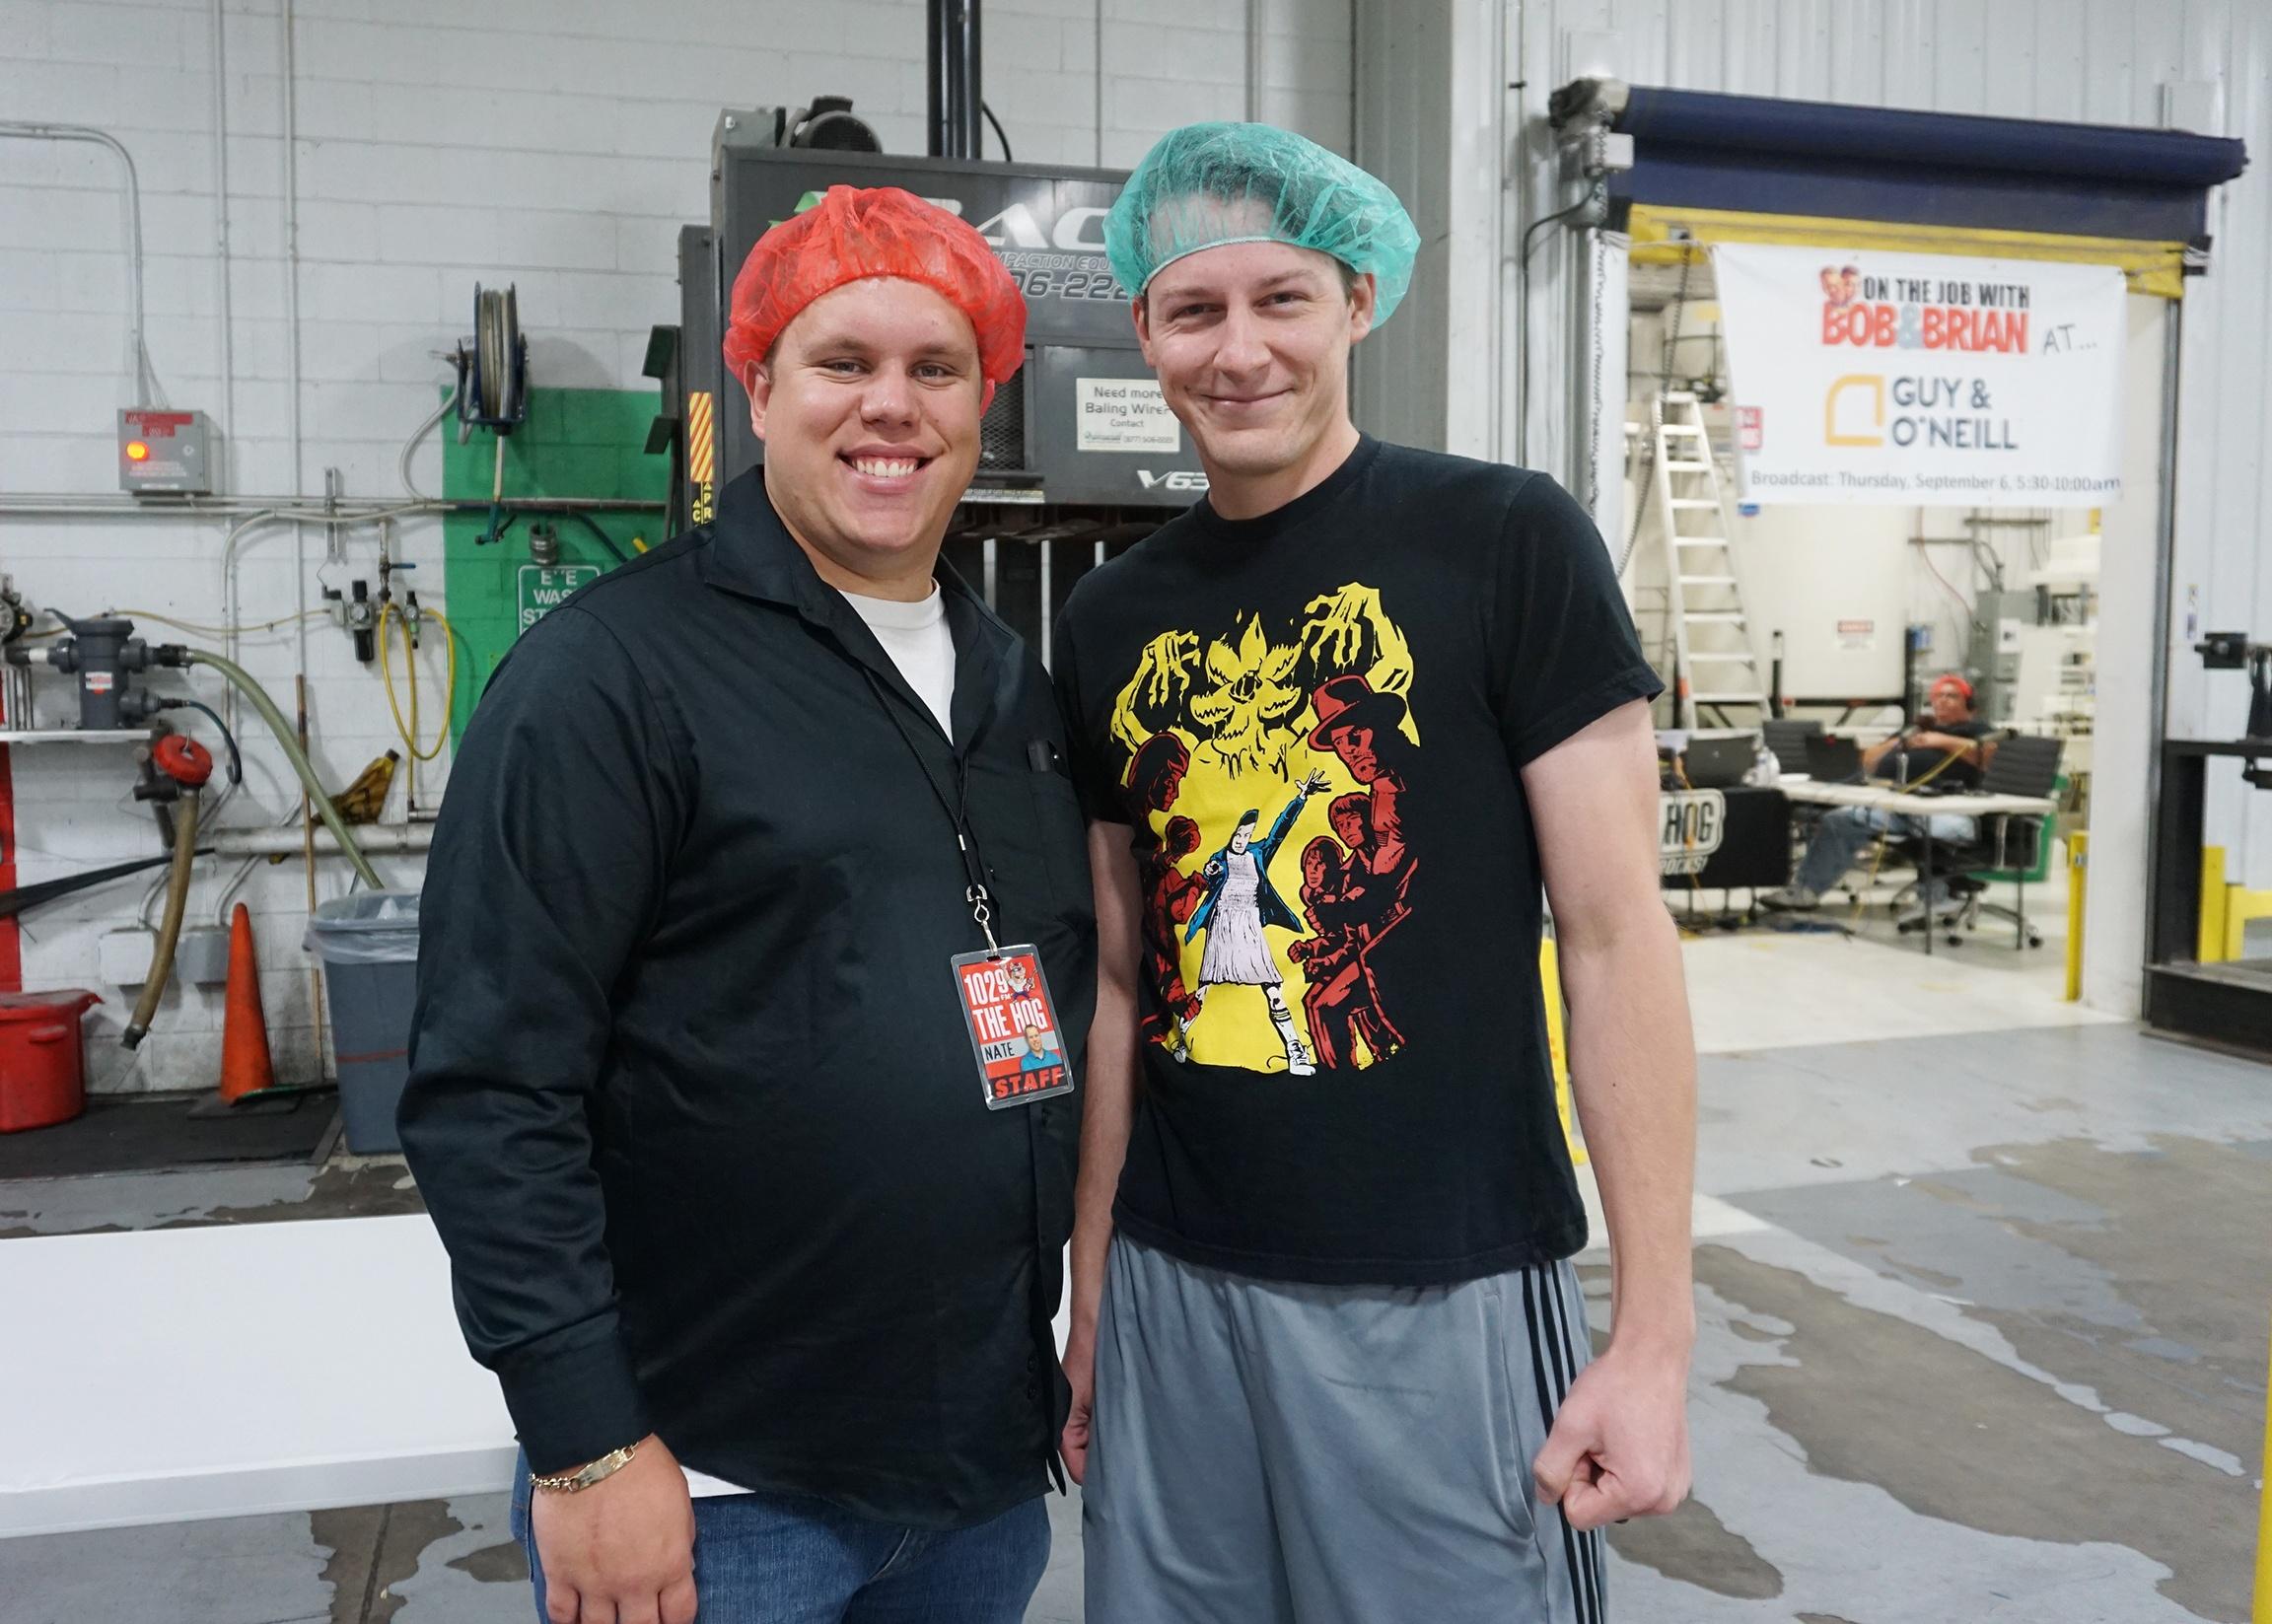 Bob & Brian at Guy & O'Neill